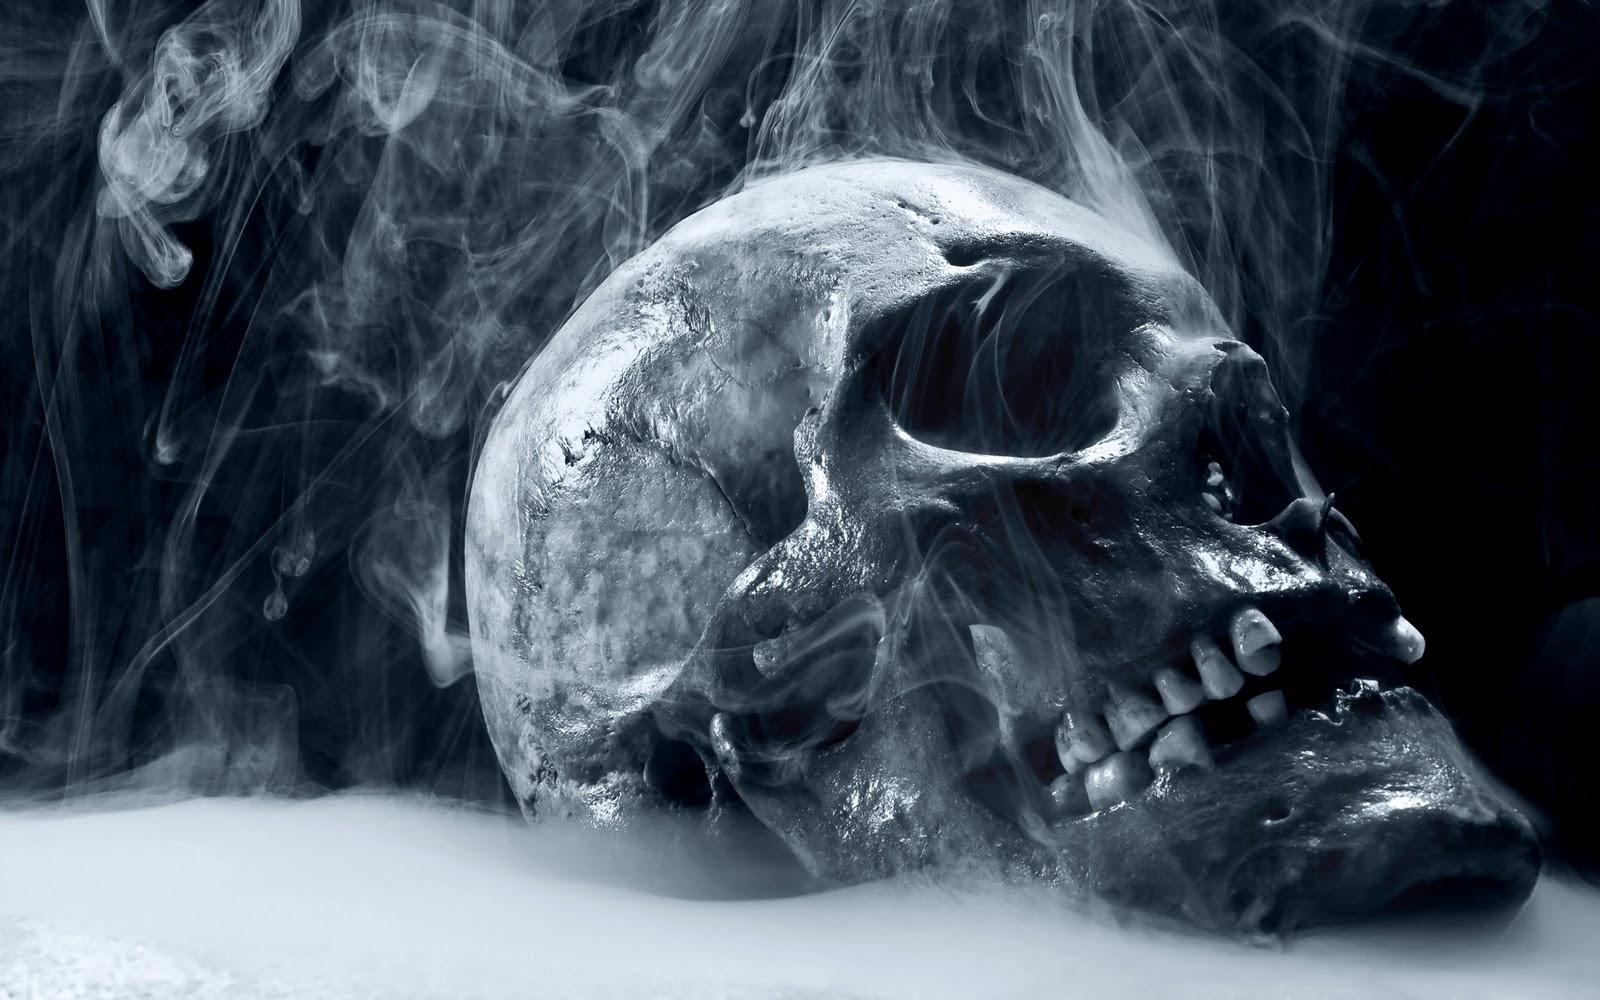 trololo blogg Skull Wallpaper Download 1600x1000